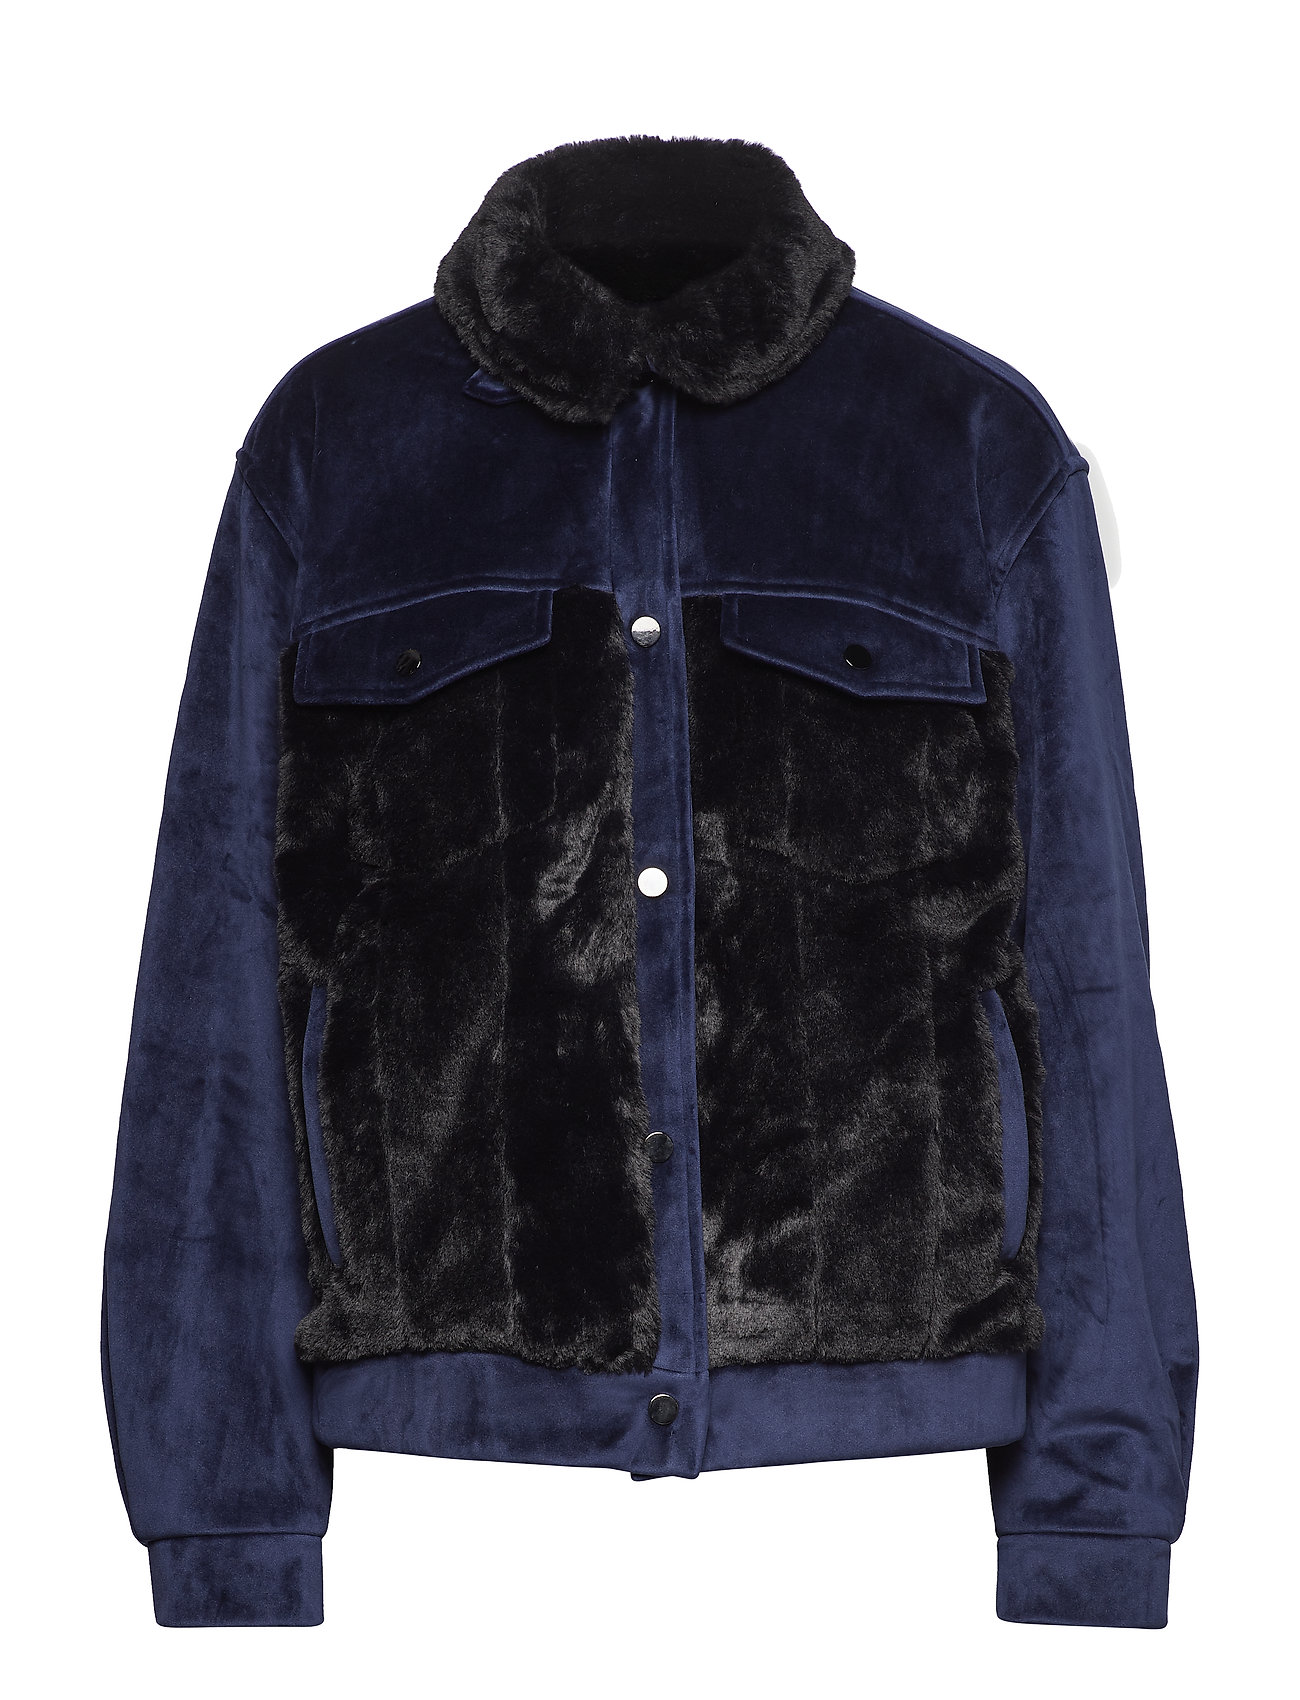 HOLZWEILER PIRANHAS Jacket Ytterkläder